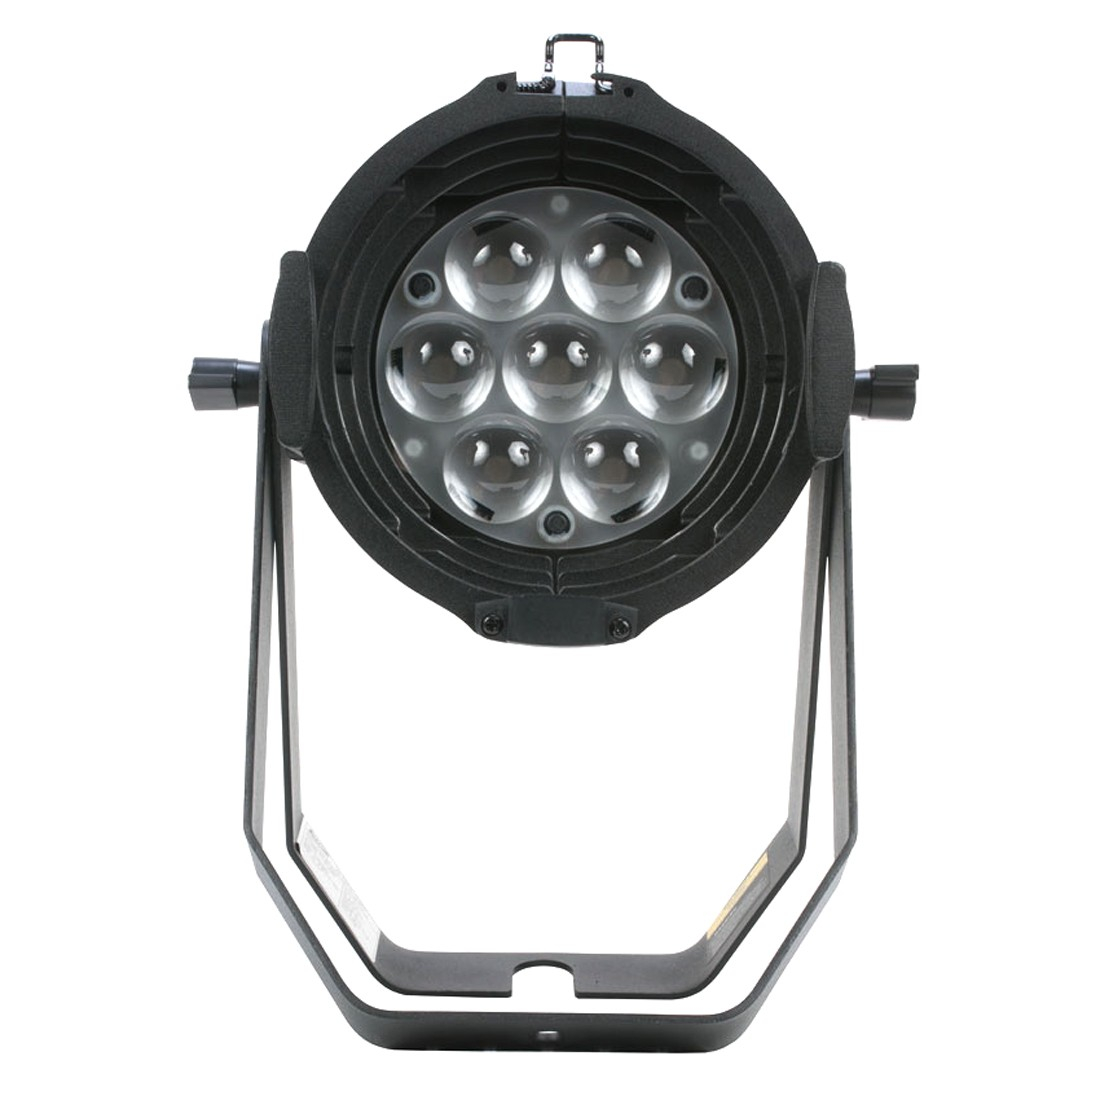 Arena Strobe Lights: Static LED Fixtures